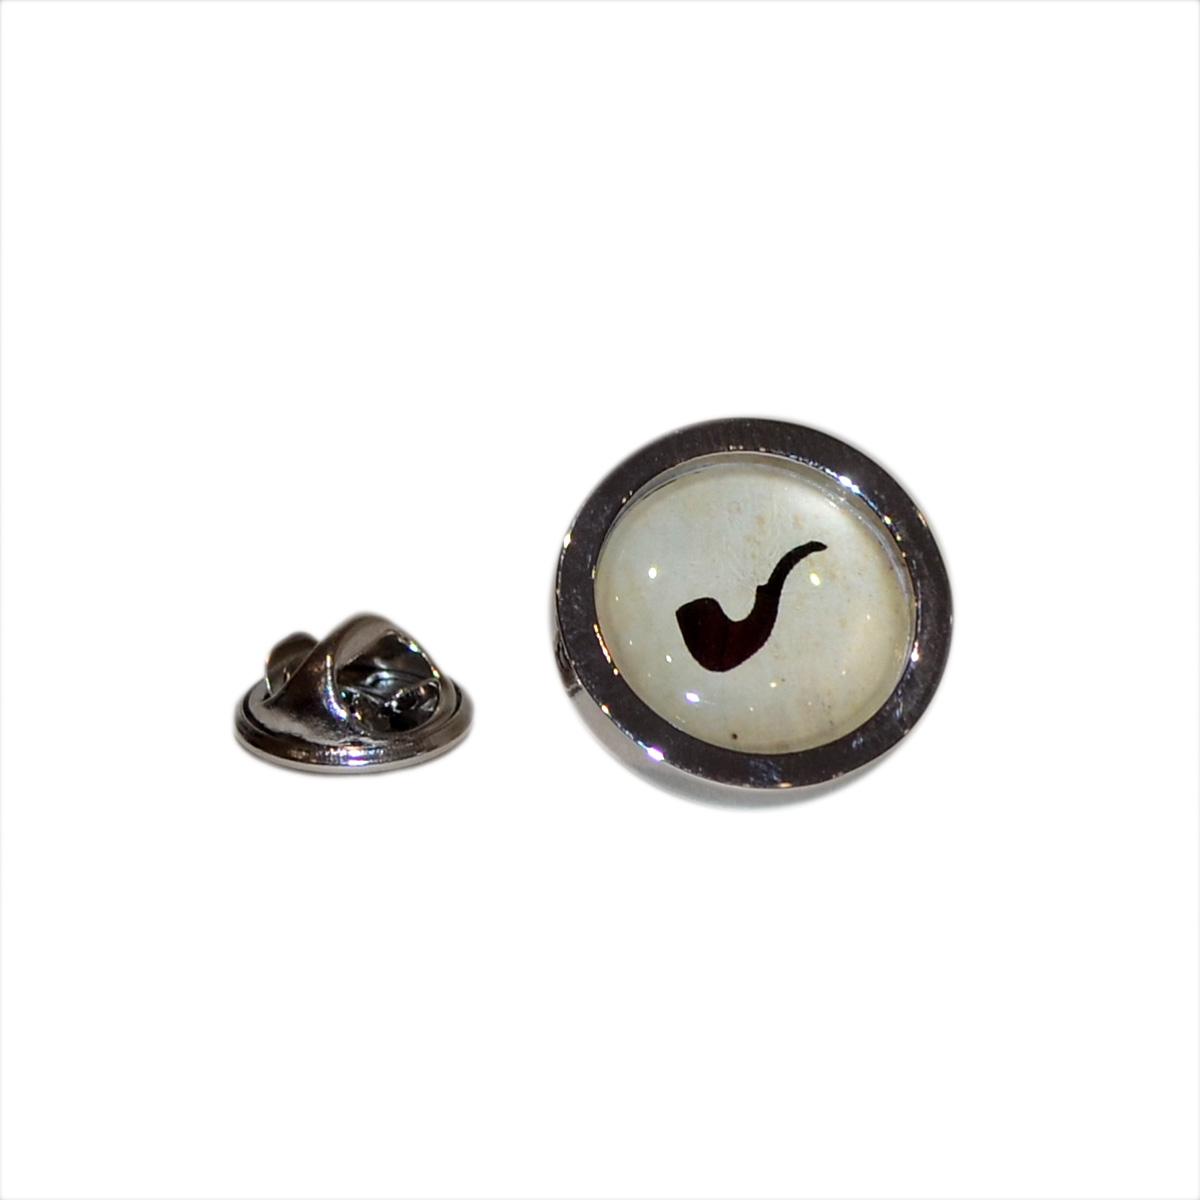 Detalles de Smoking Pipe Design Lapel Pin Badge Gifts For Him